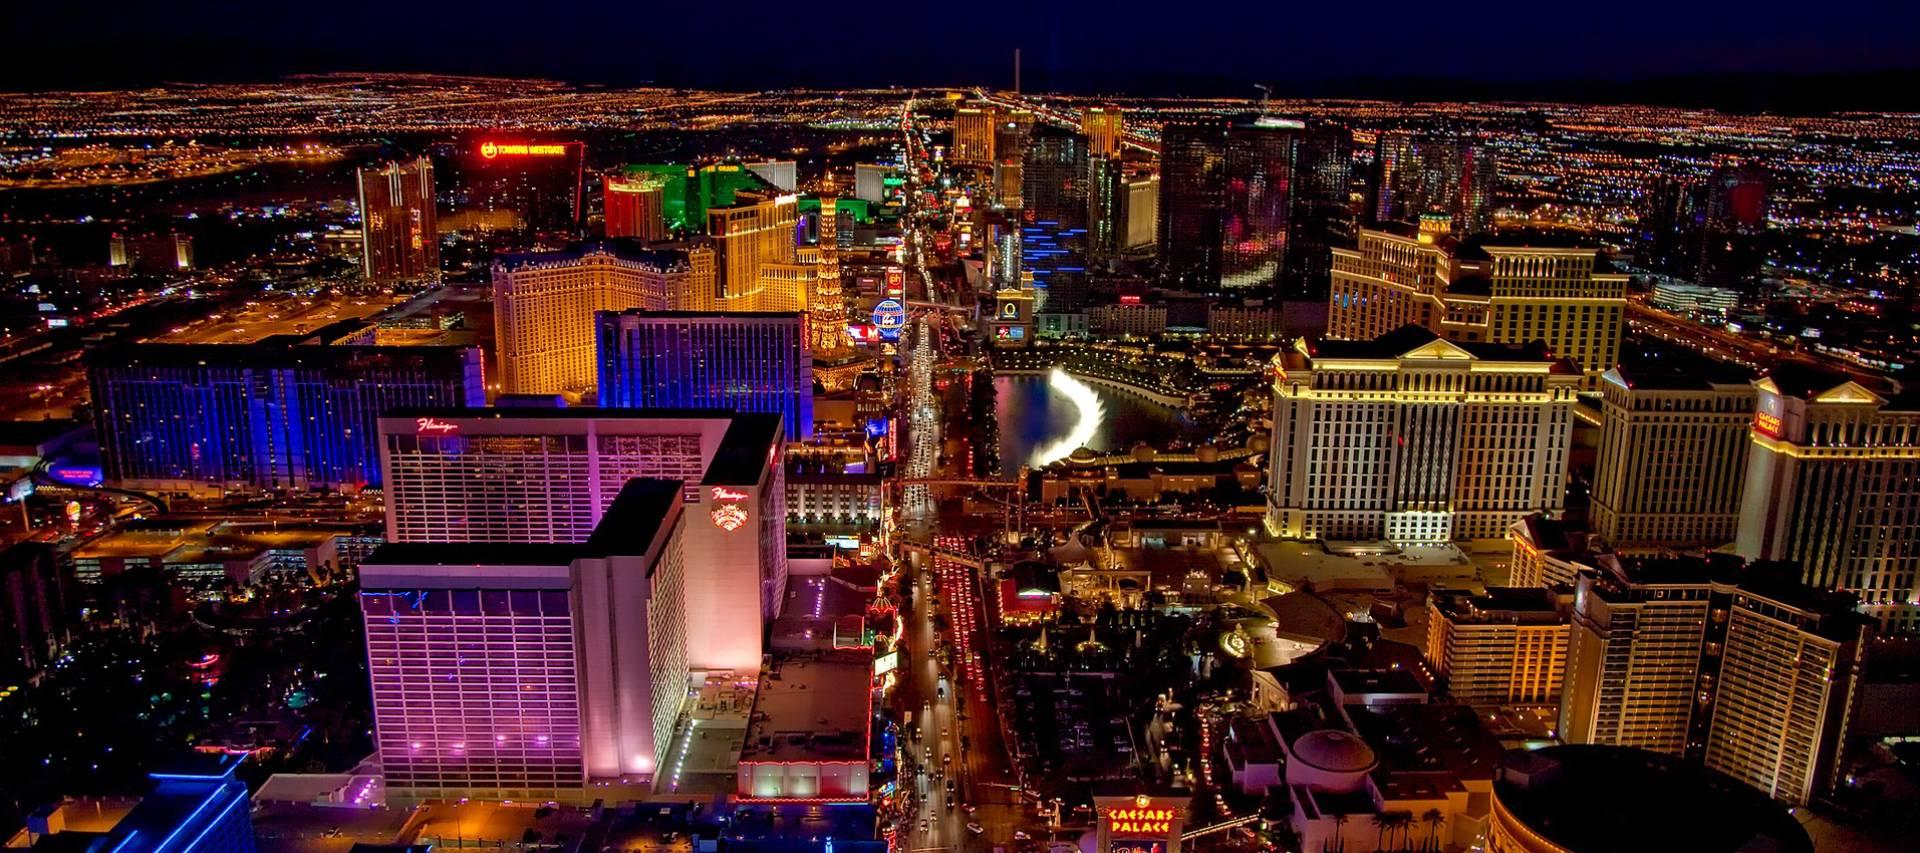 Aerial view of Las Vegas' Strip